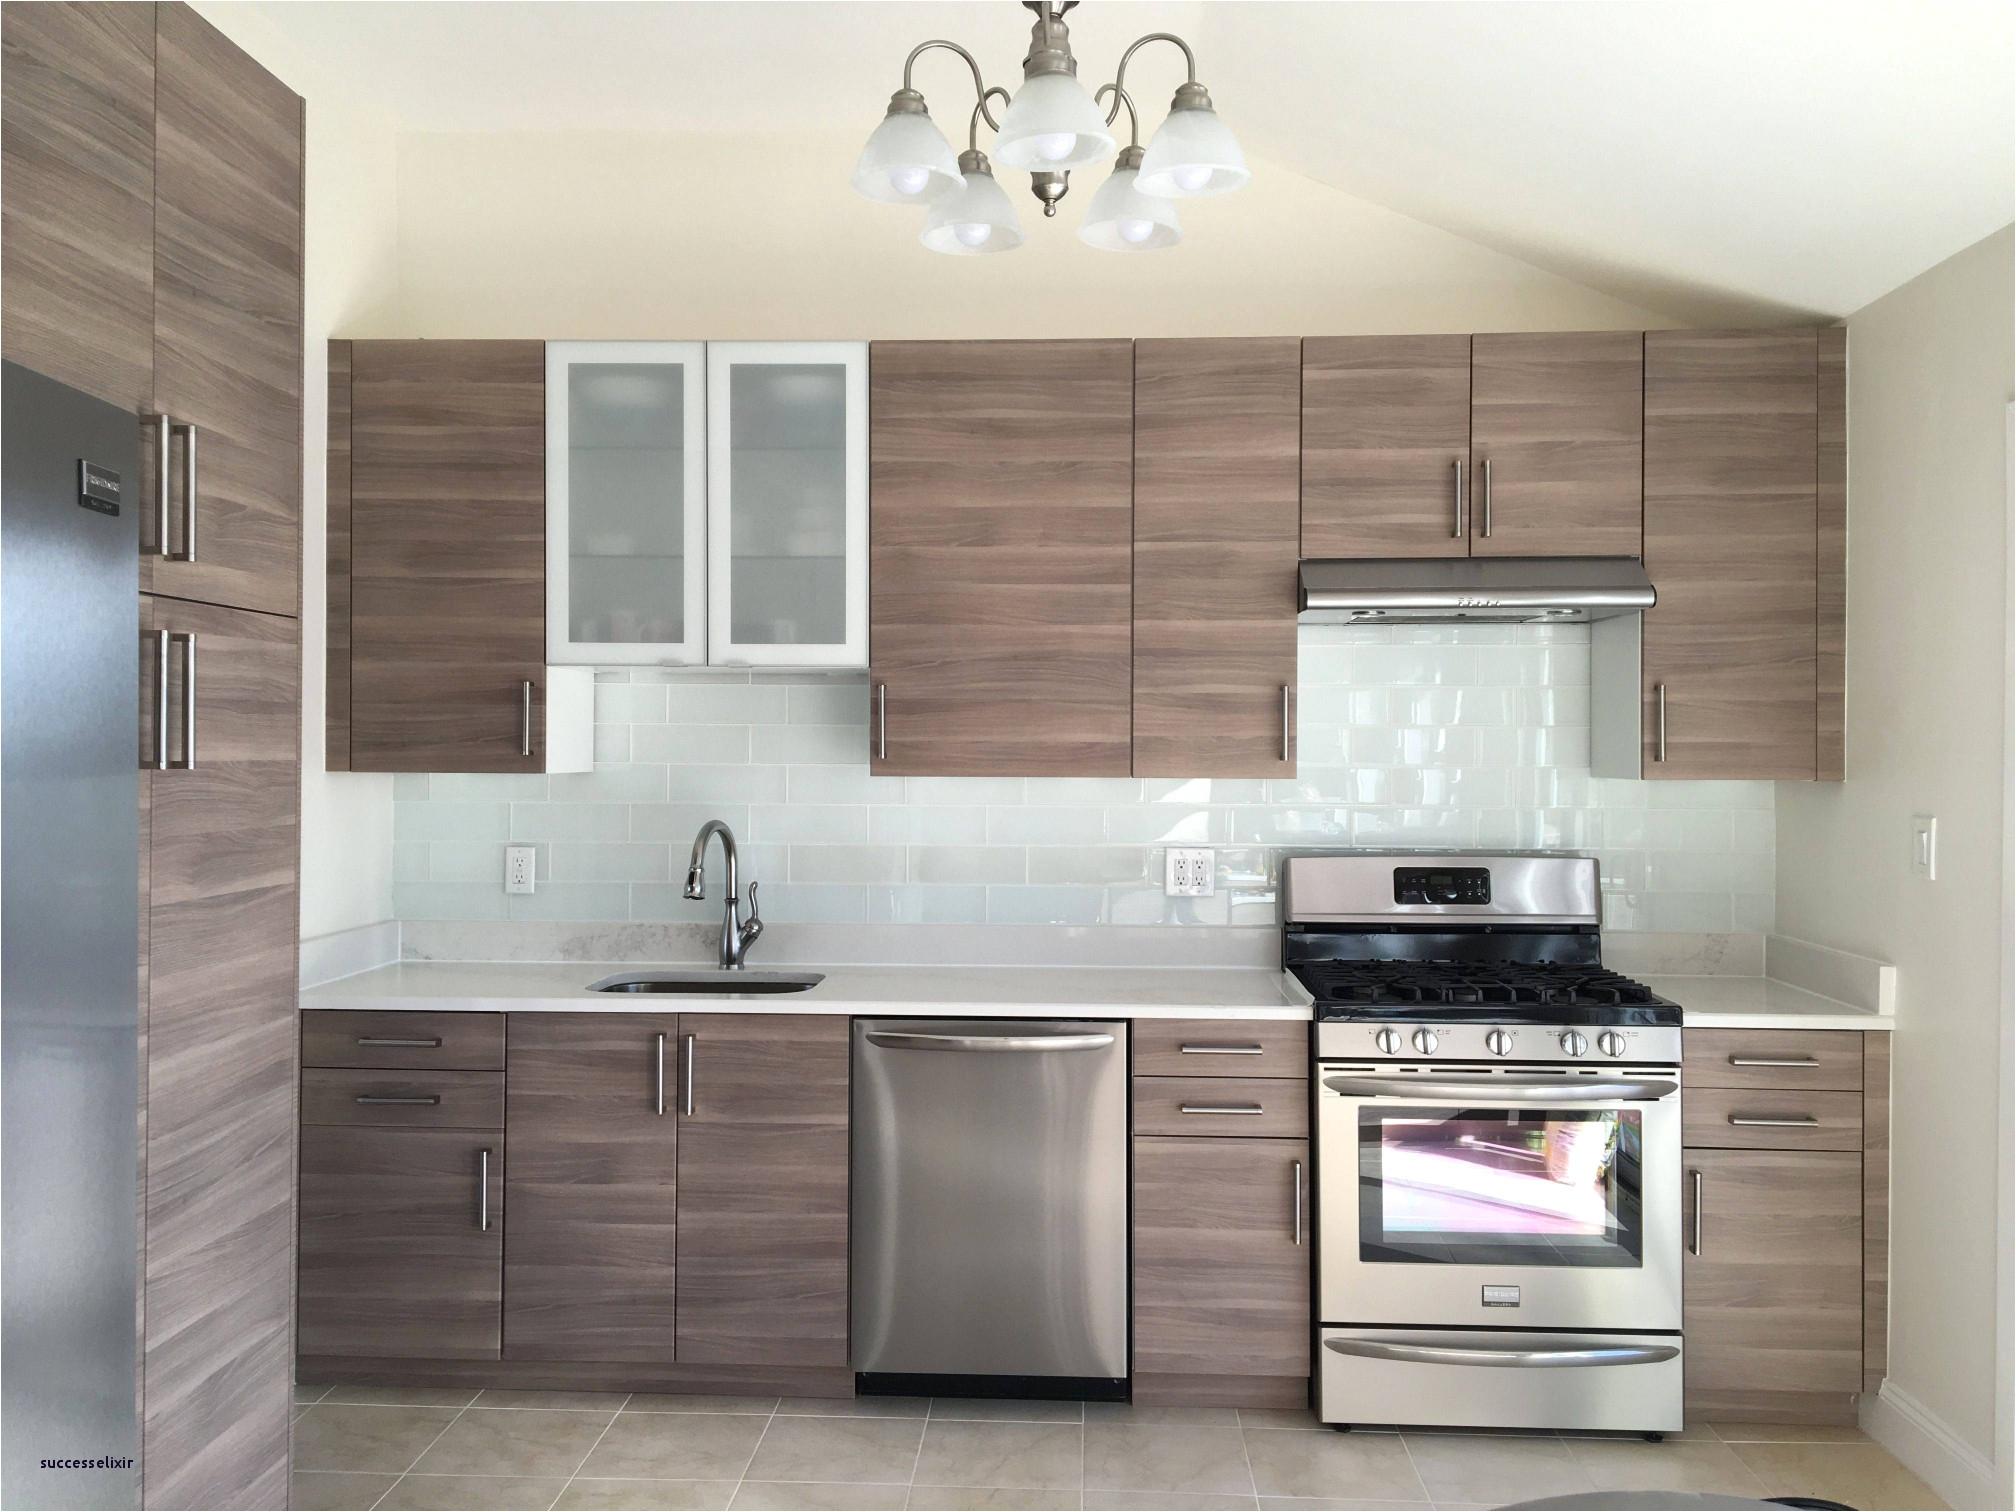 Kitchen and Bath Design Inspirational Ikea Kitchen Cabinet Doors Elegant Samples Awesome Design 0d